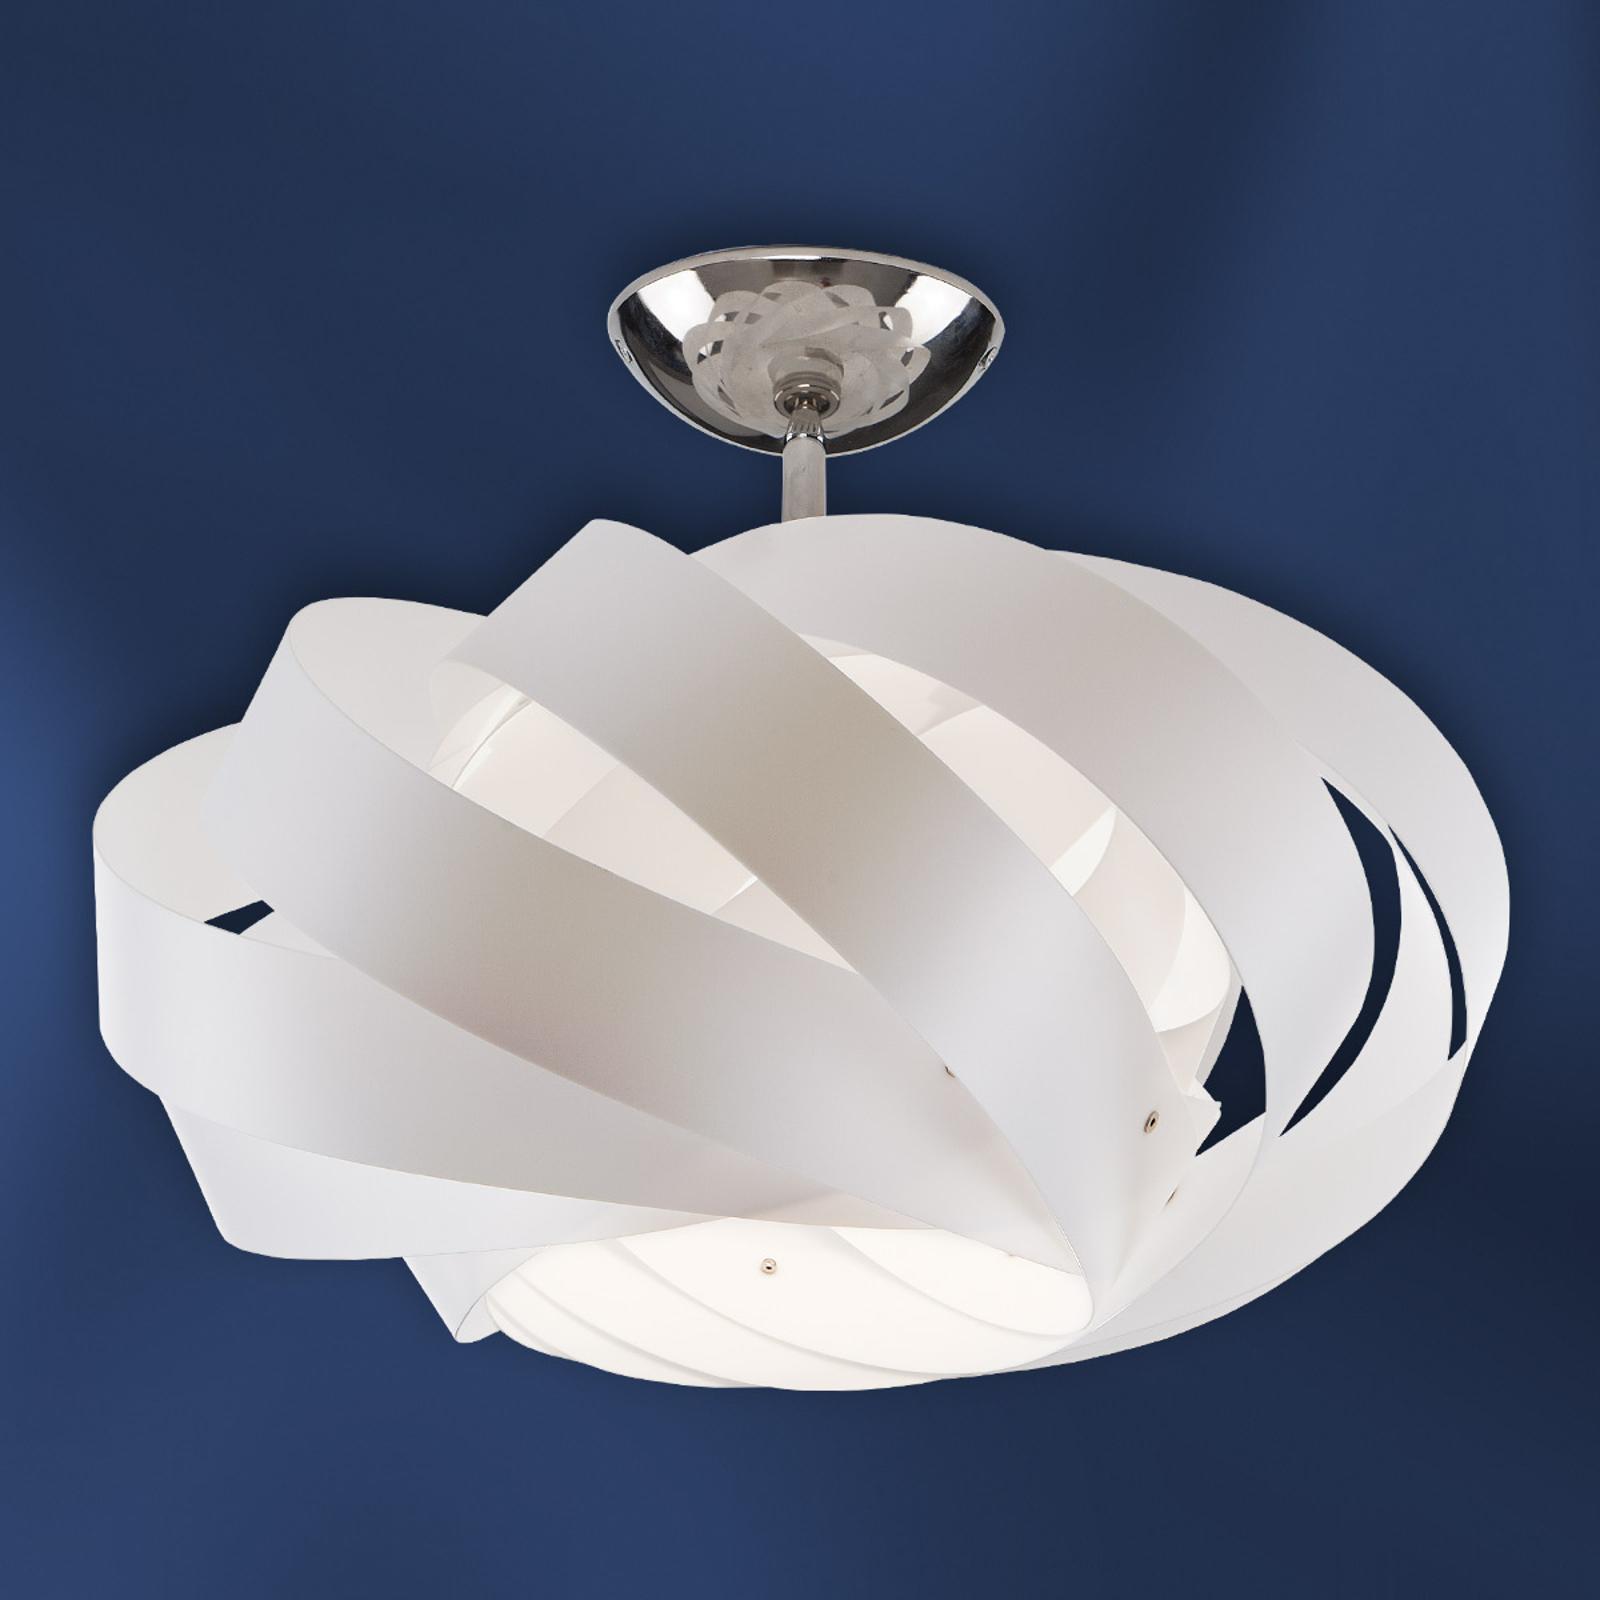 Taklampa Sky Mini Nest vit